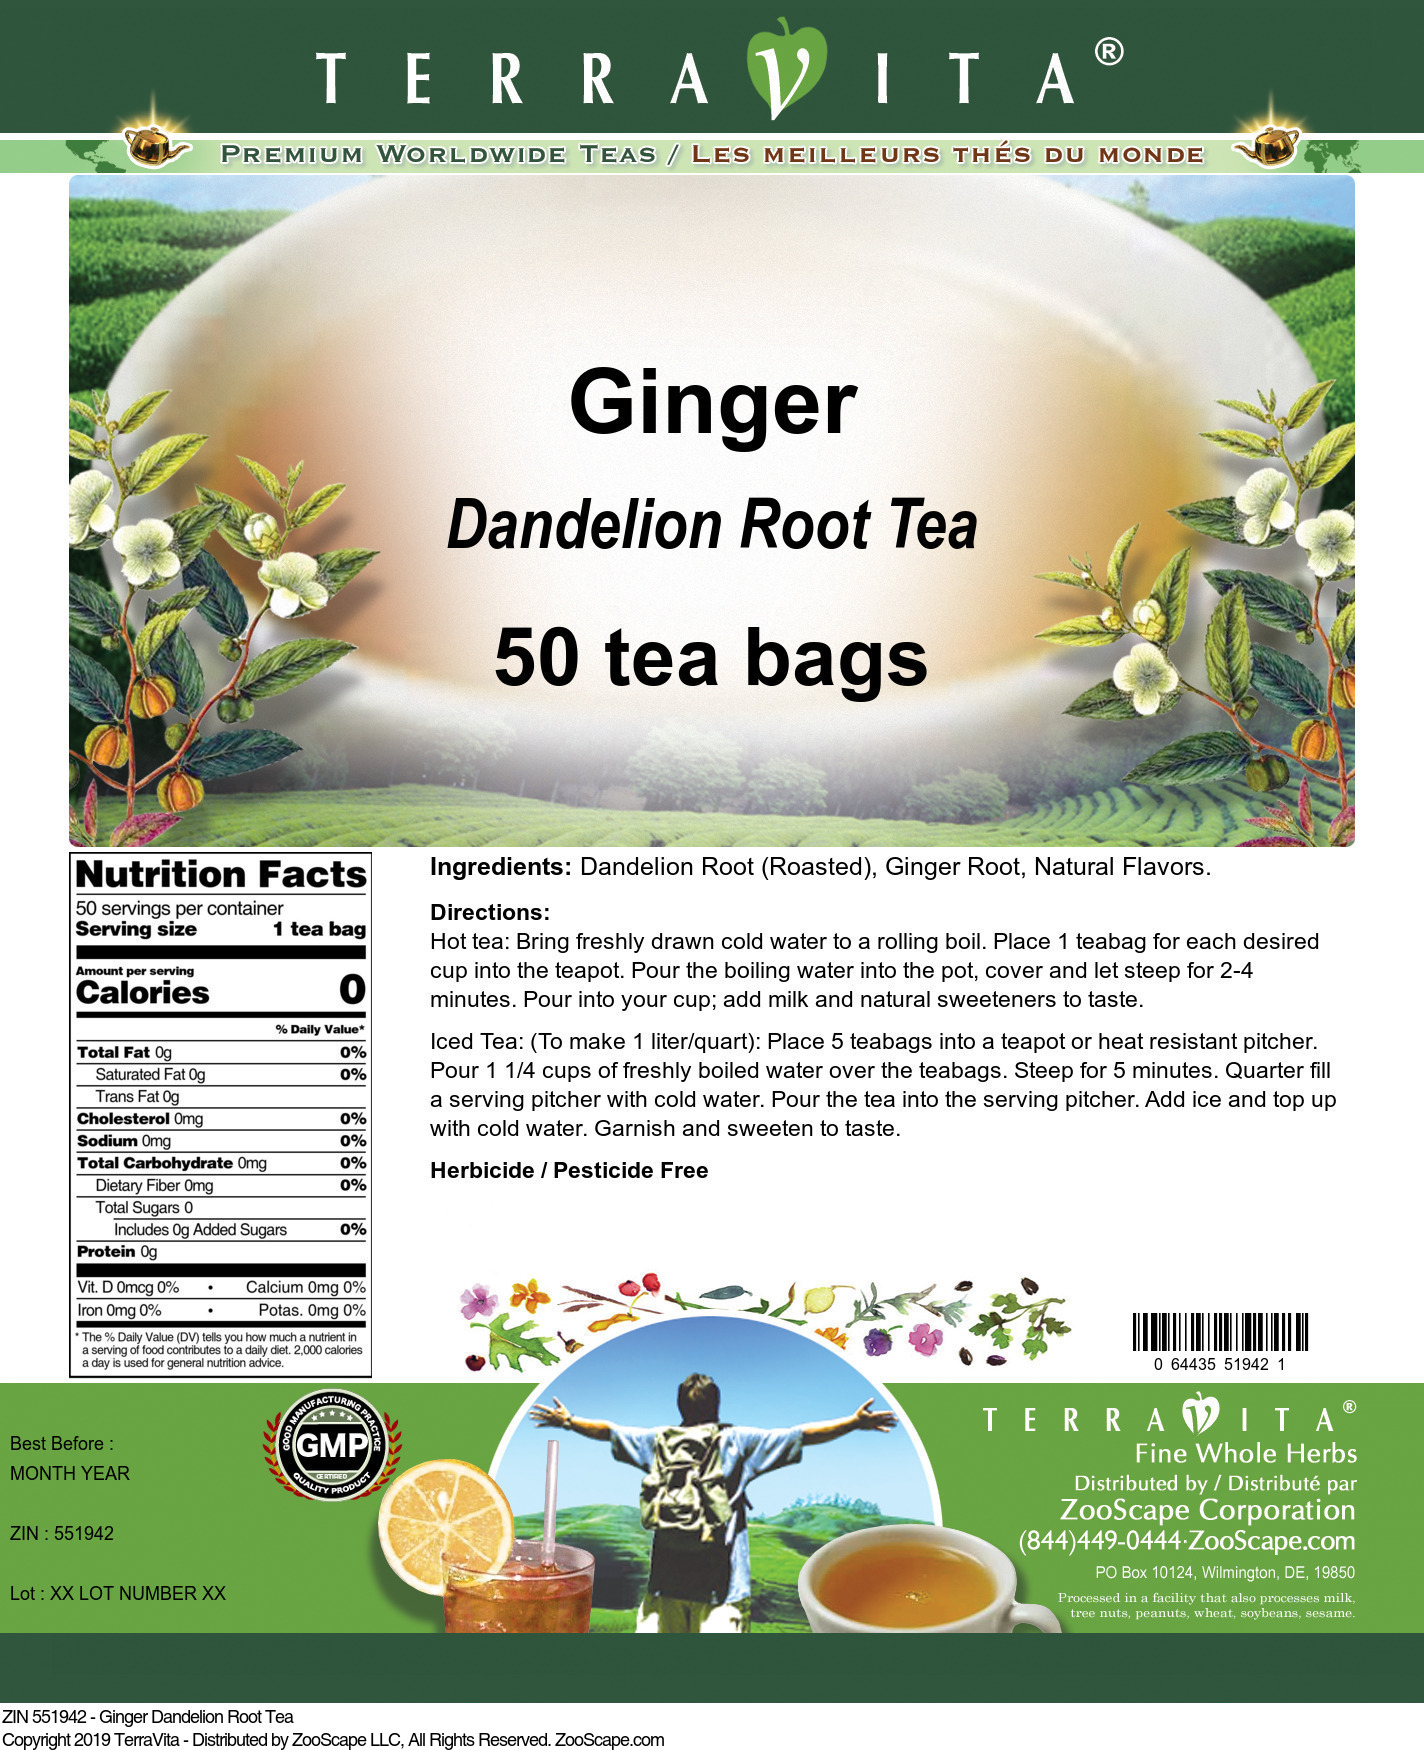 Ginger Dandelion Root